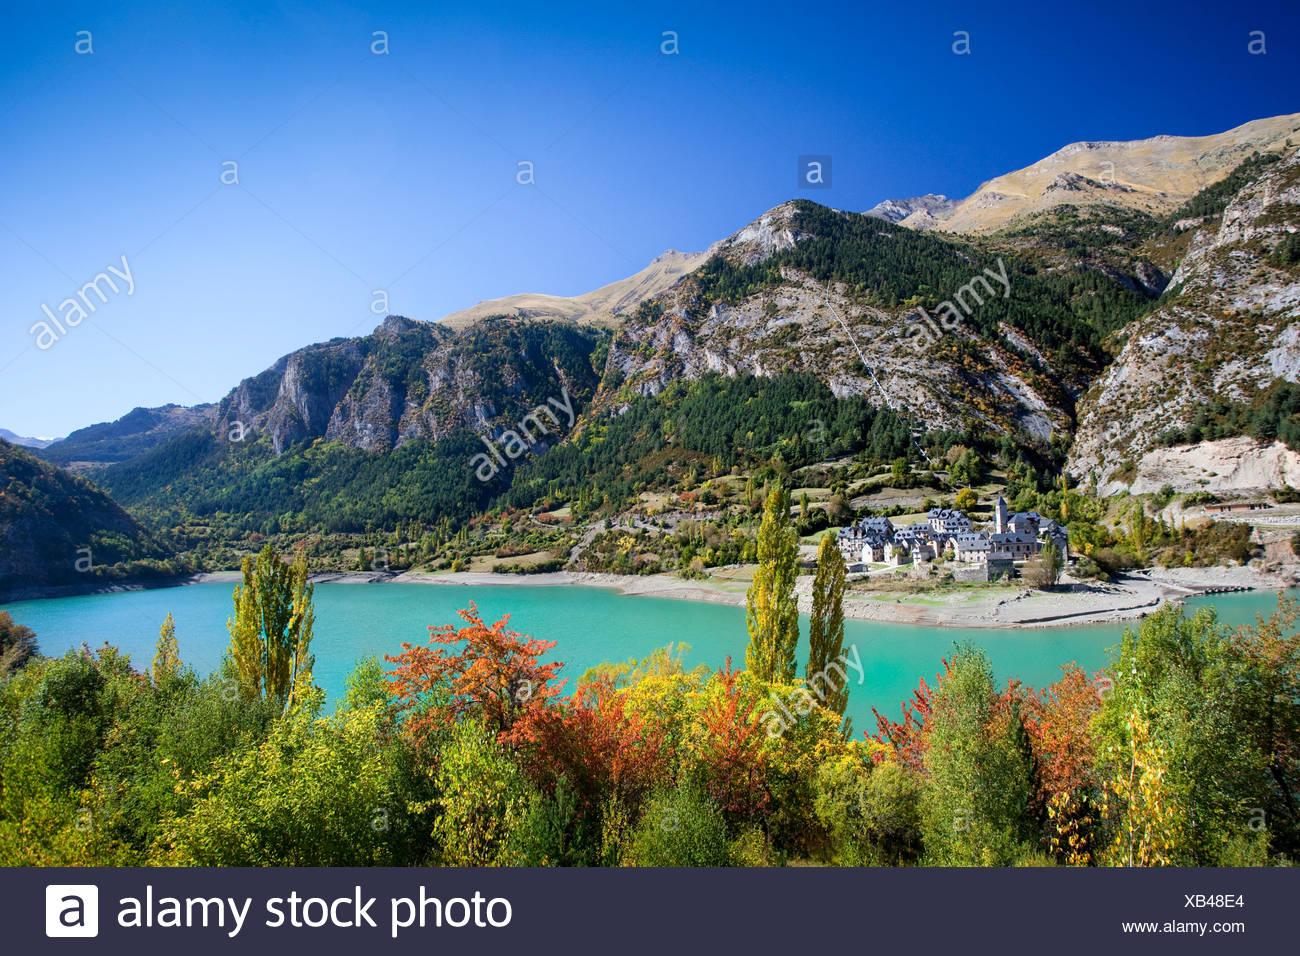 Spain, Europe, Aragon, Huesca, Pyrenees, Lanuza, mountains, lake, sea, trees, autumn Stock Photo